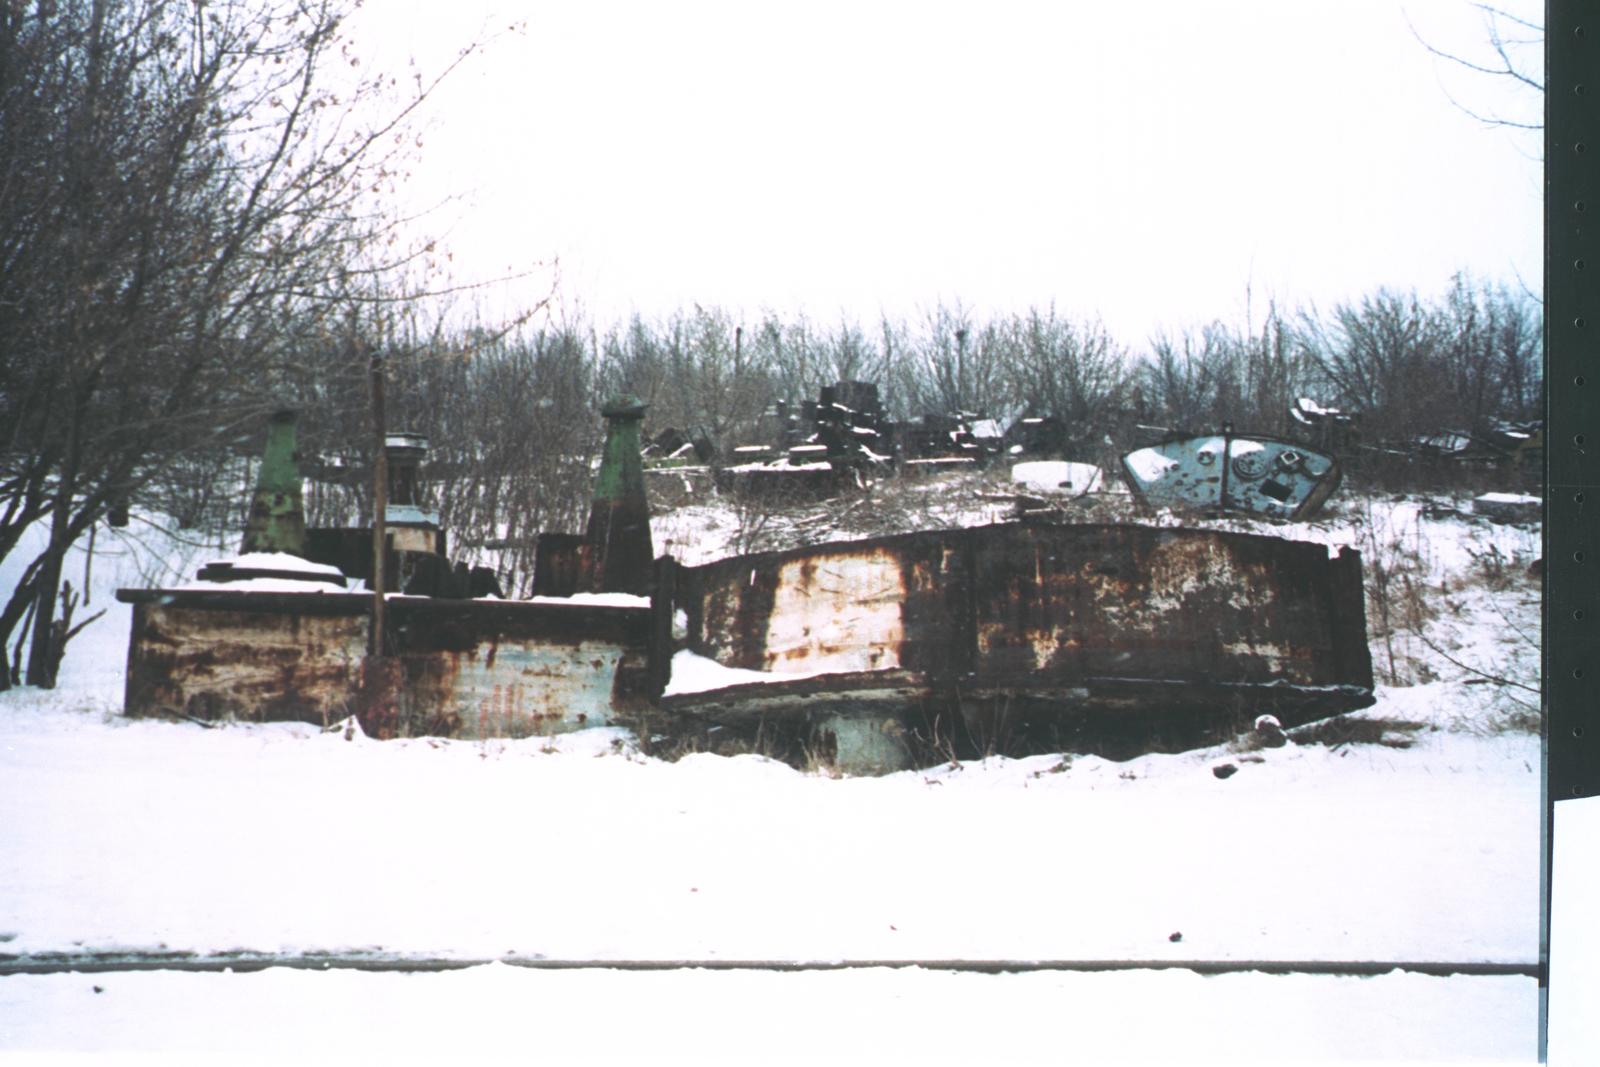 Ukraine - WMD Dismantlement - April 1995 - Inspection team visit to various ruins of former Soviet Union (FSU) Weapons of Mass Destruction (WMD) production facilities